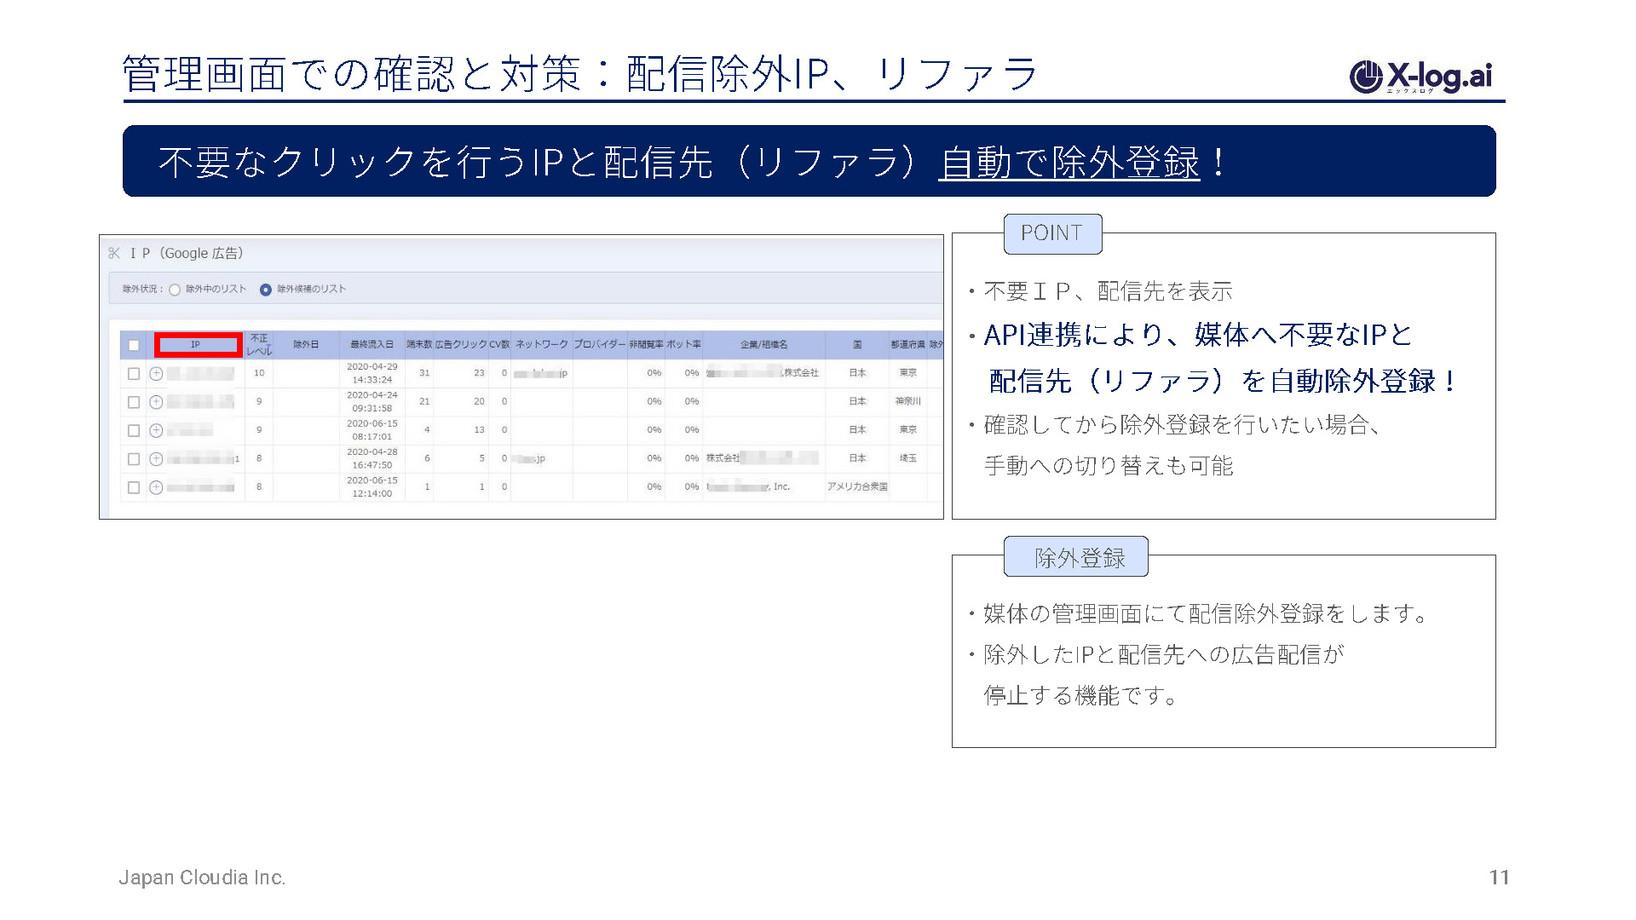 X-log.aiご案内資料_ページ_11.jpg